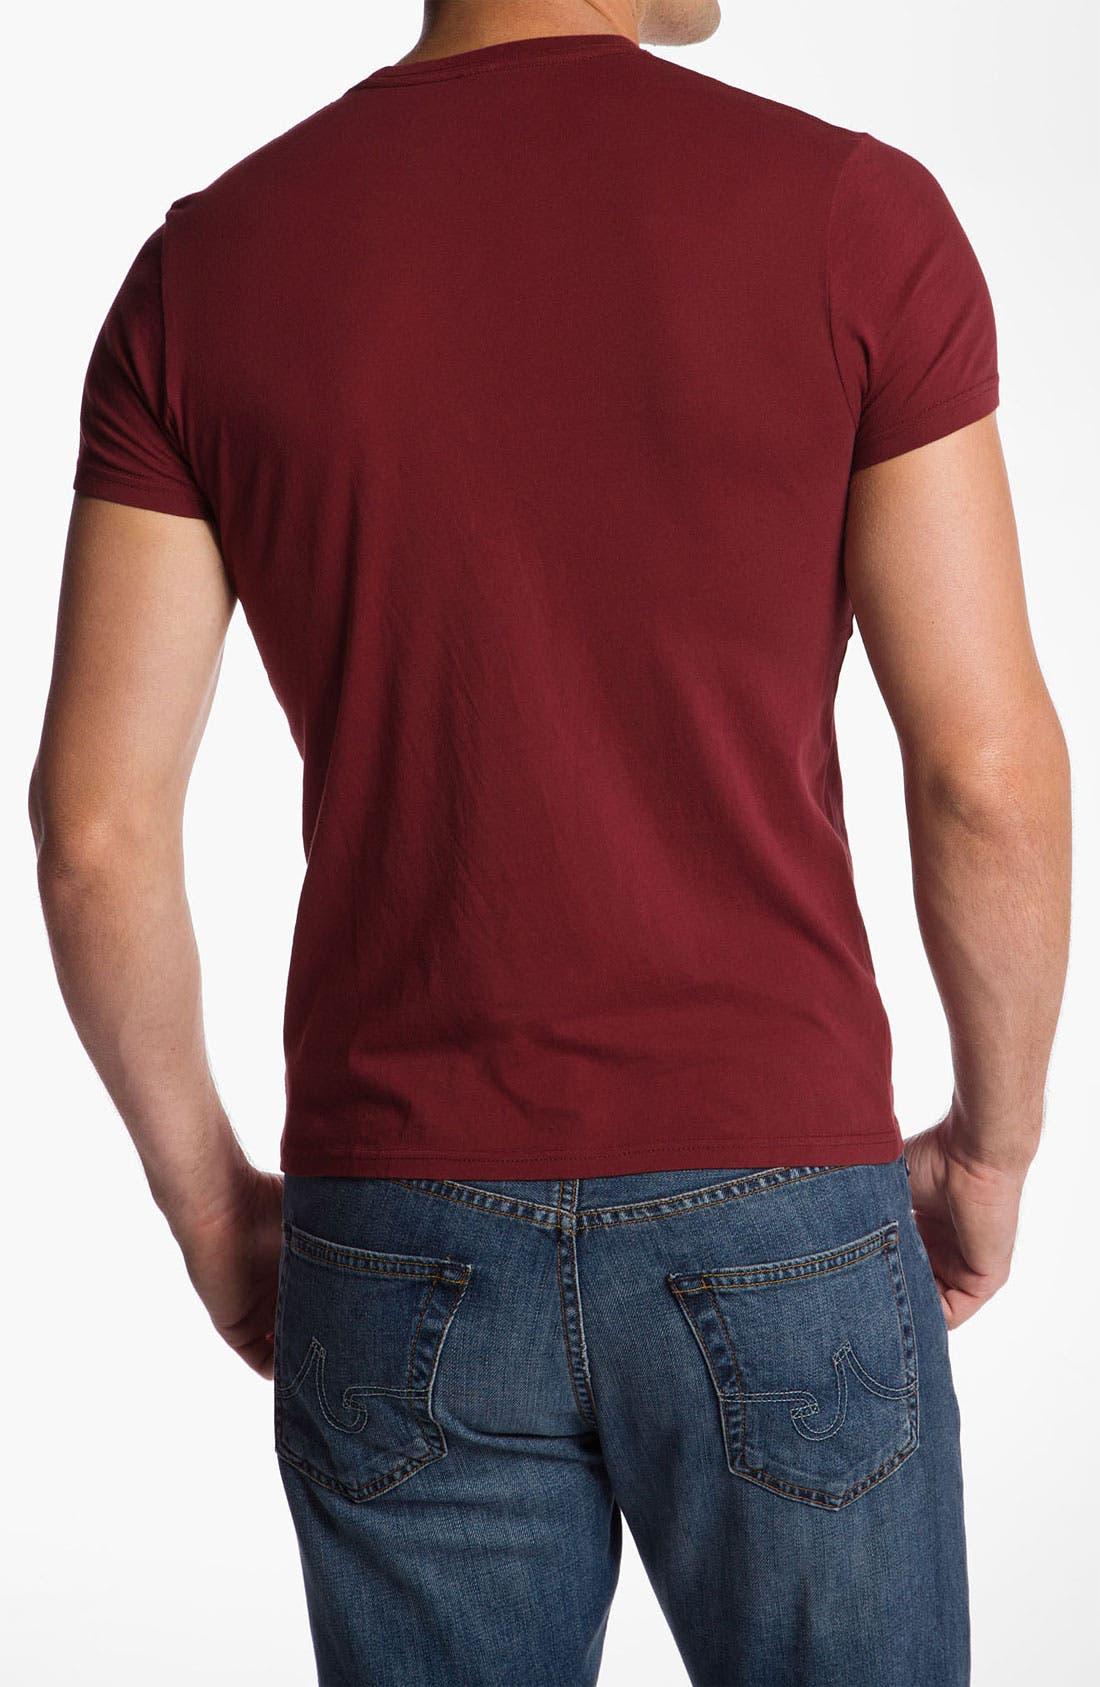 Alternate Image 2  - The Original Retro Brand 'Arizona State Sun Devils' T-Shirt